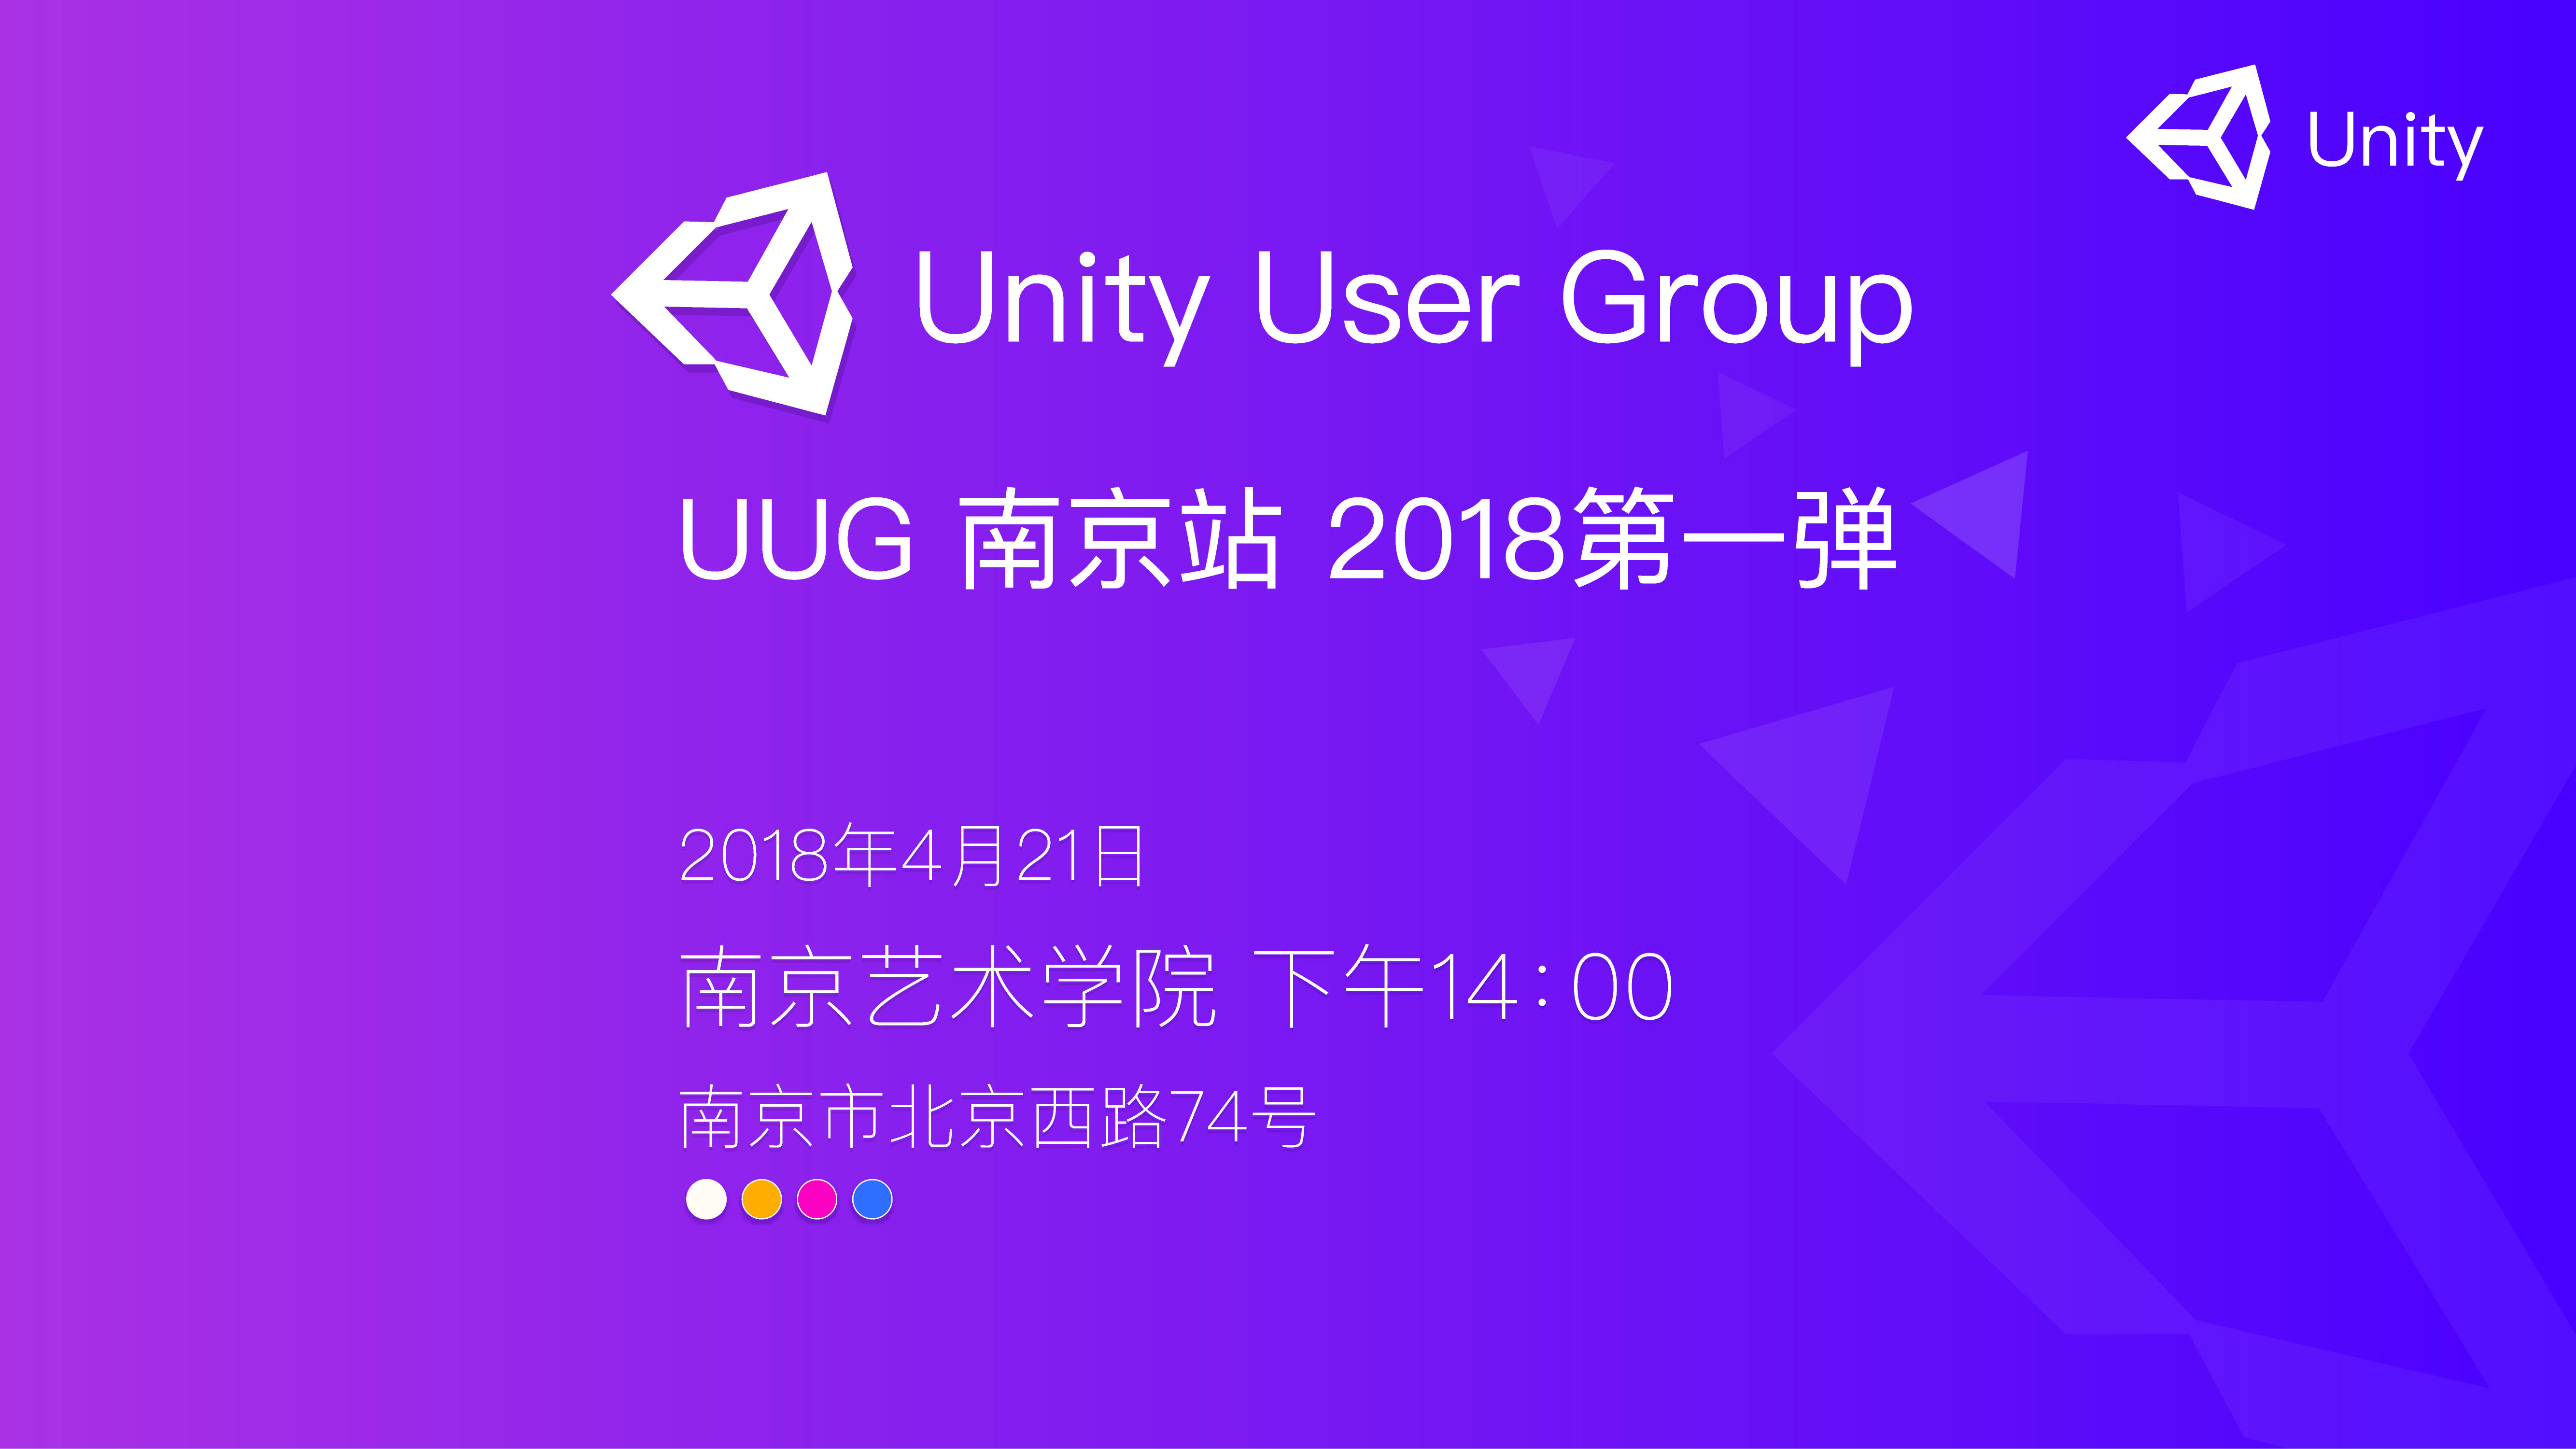 UUG南京2018首次活动